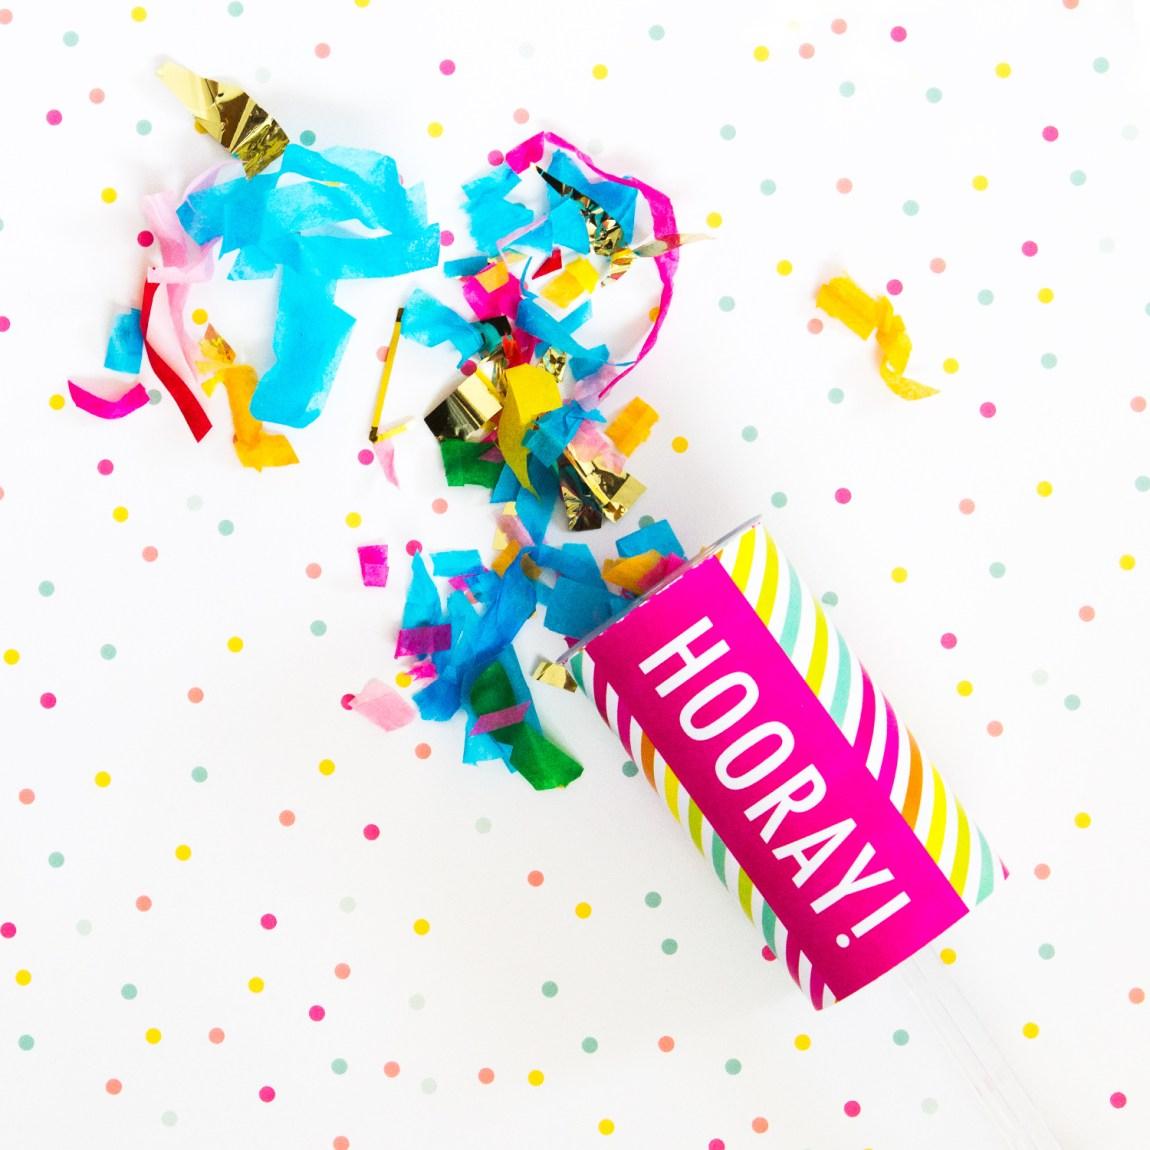 Hooray! Cute confetti poppers by Studio Pep.